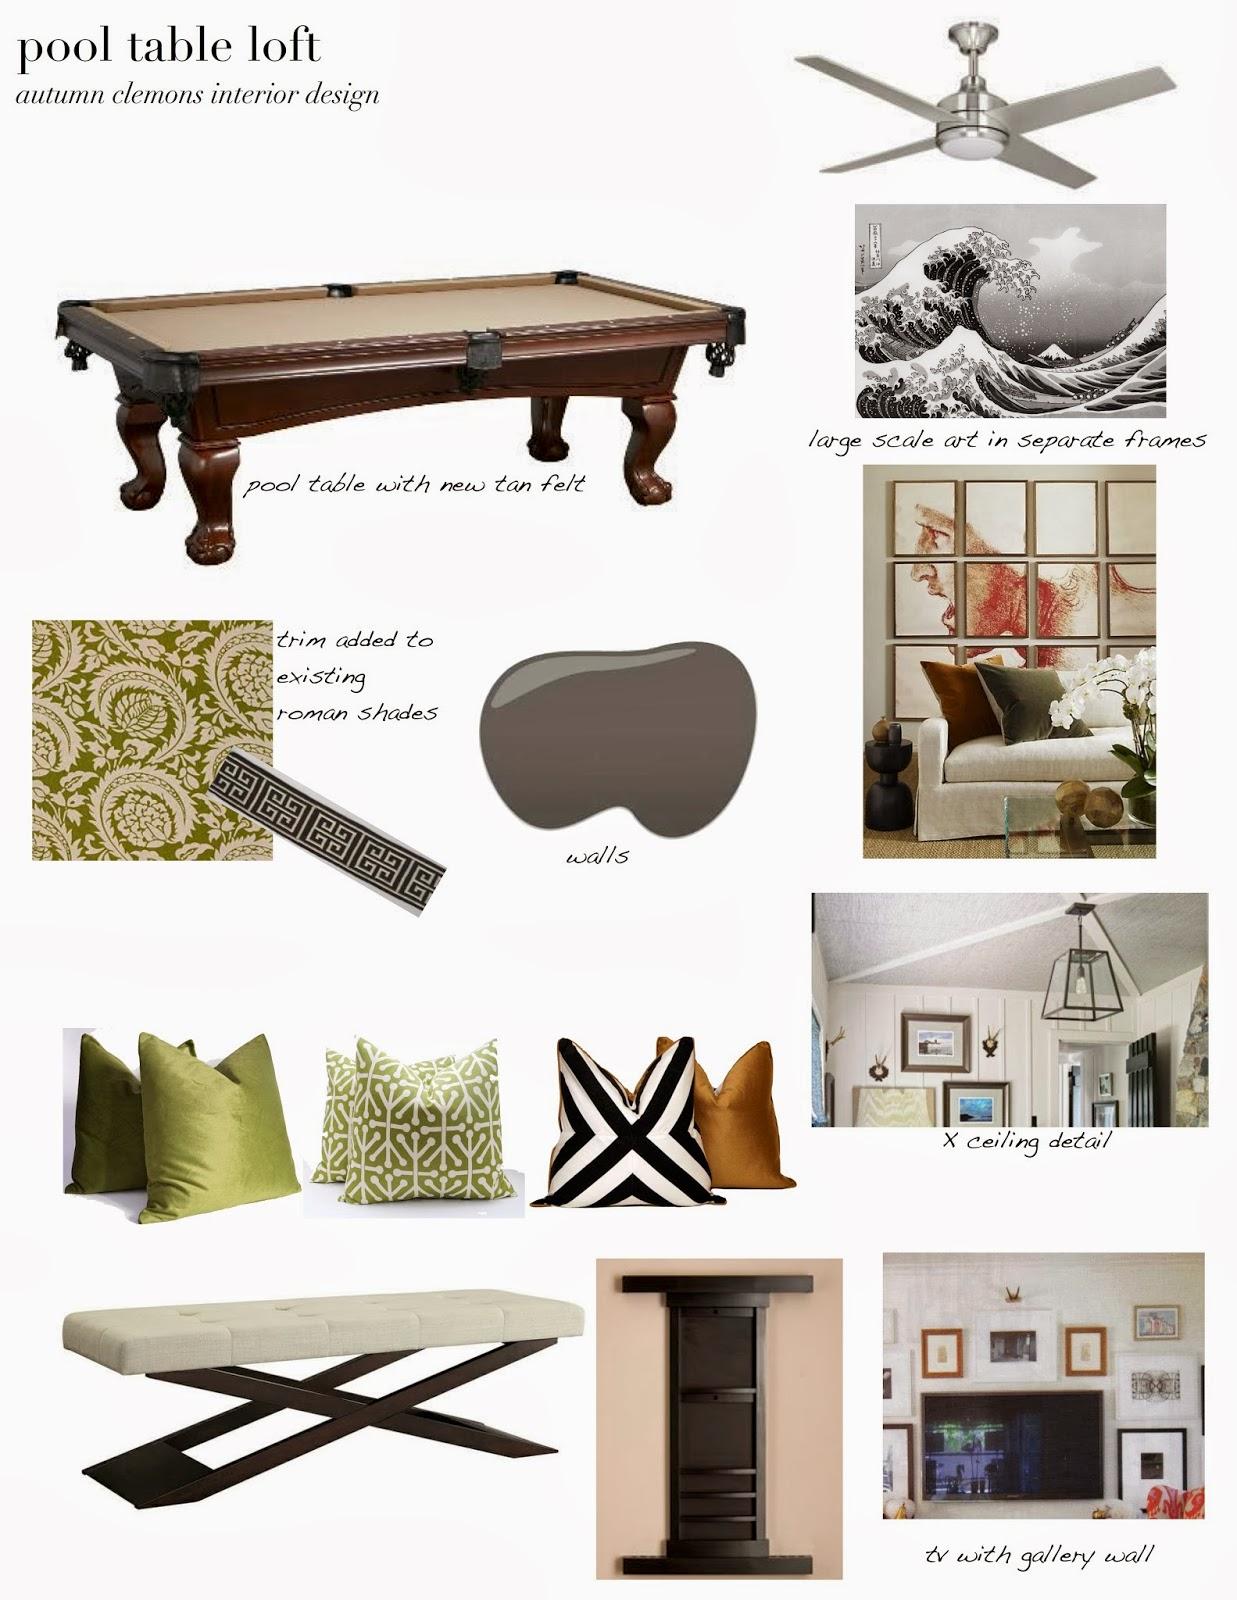 Design Dump Design Plan Pool Table Loft - Pool table wanted